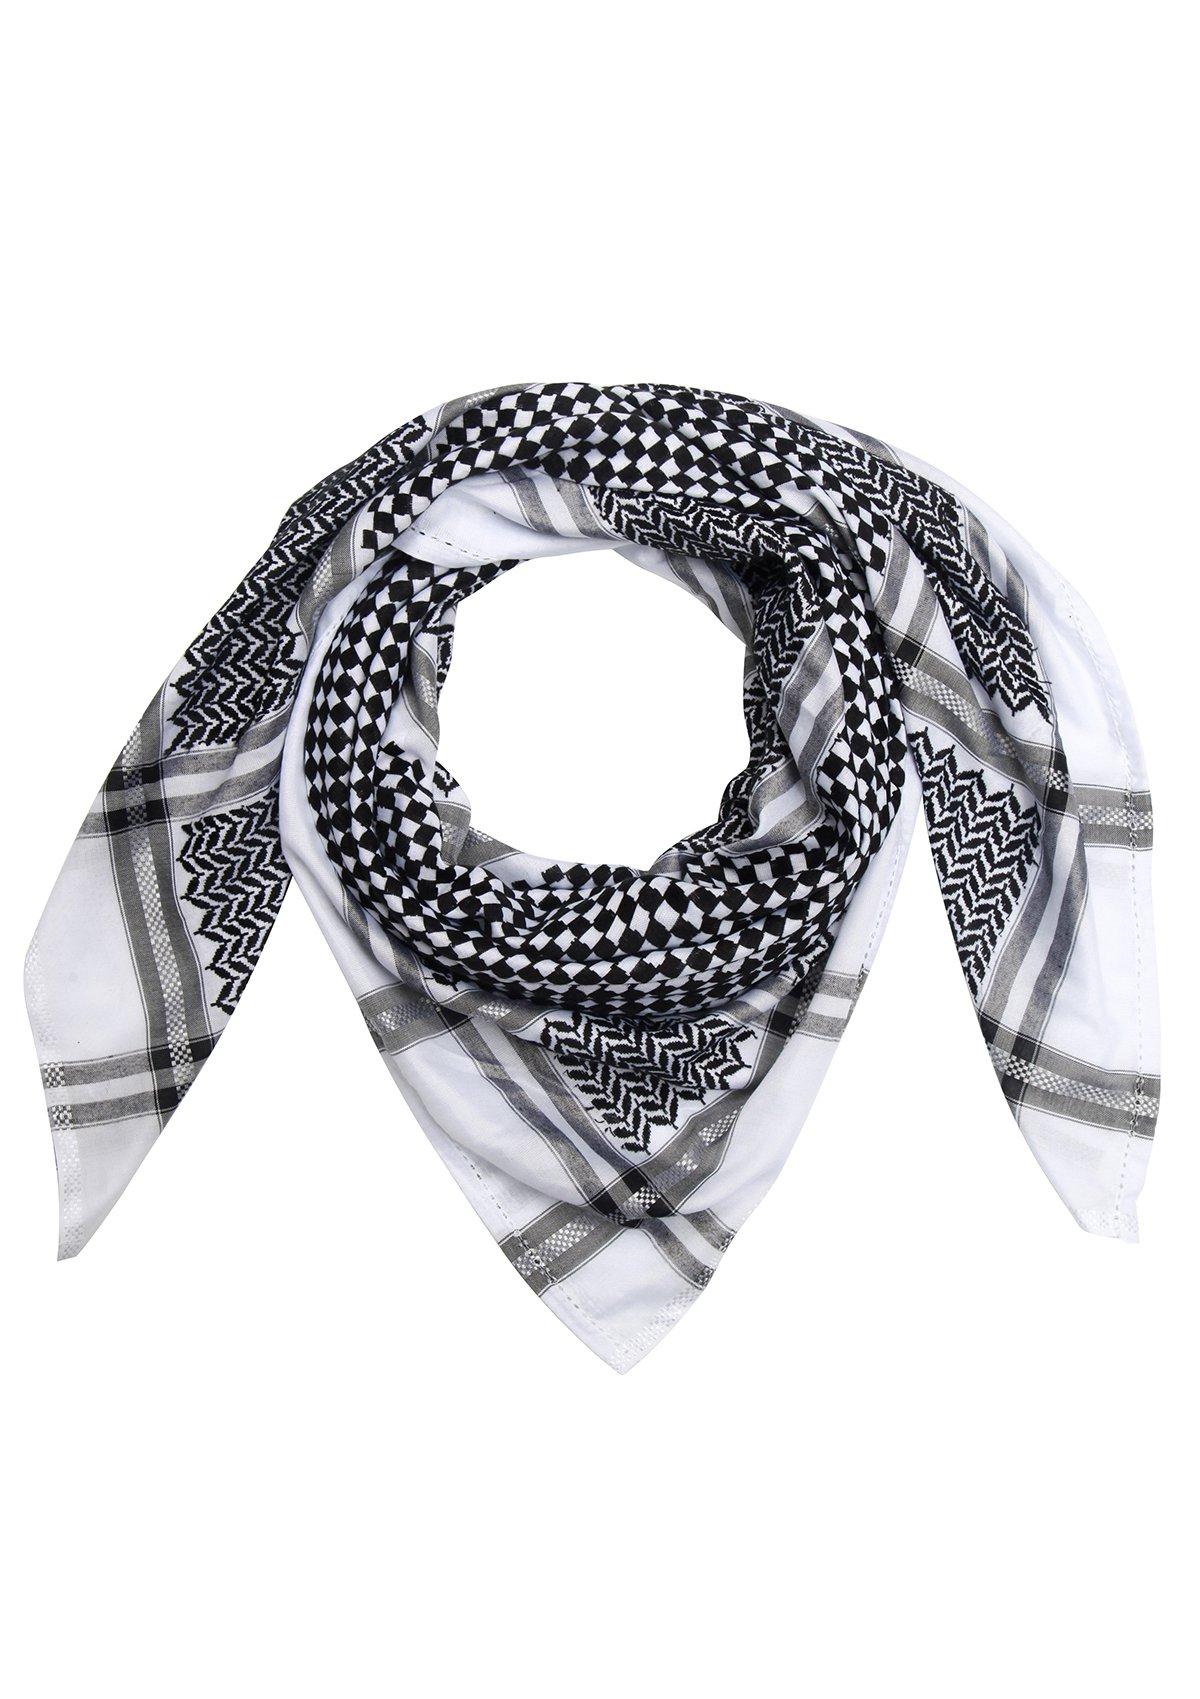 Merewill Premium Original Arabic Scarf 100% Cotton Shemagh Keffiyeh 49''x49'' Arab Scarf Classic Black